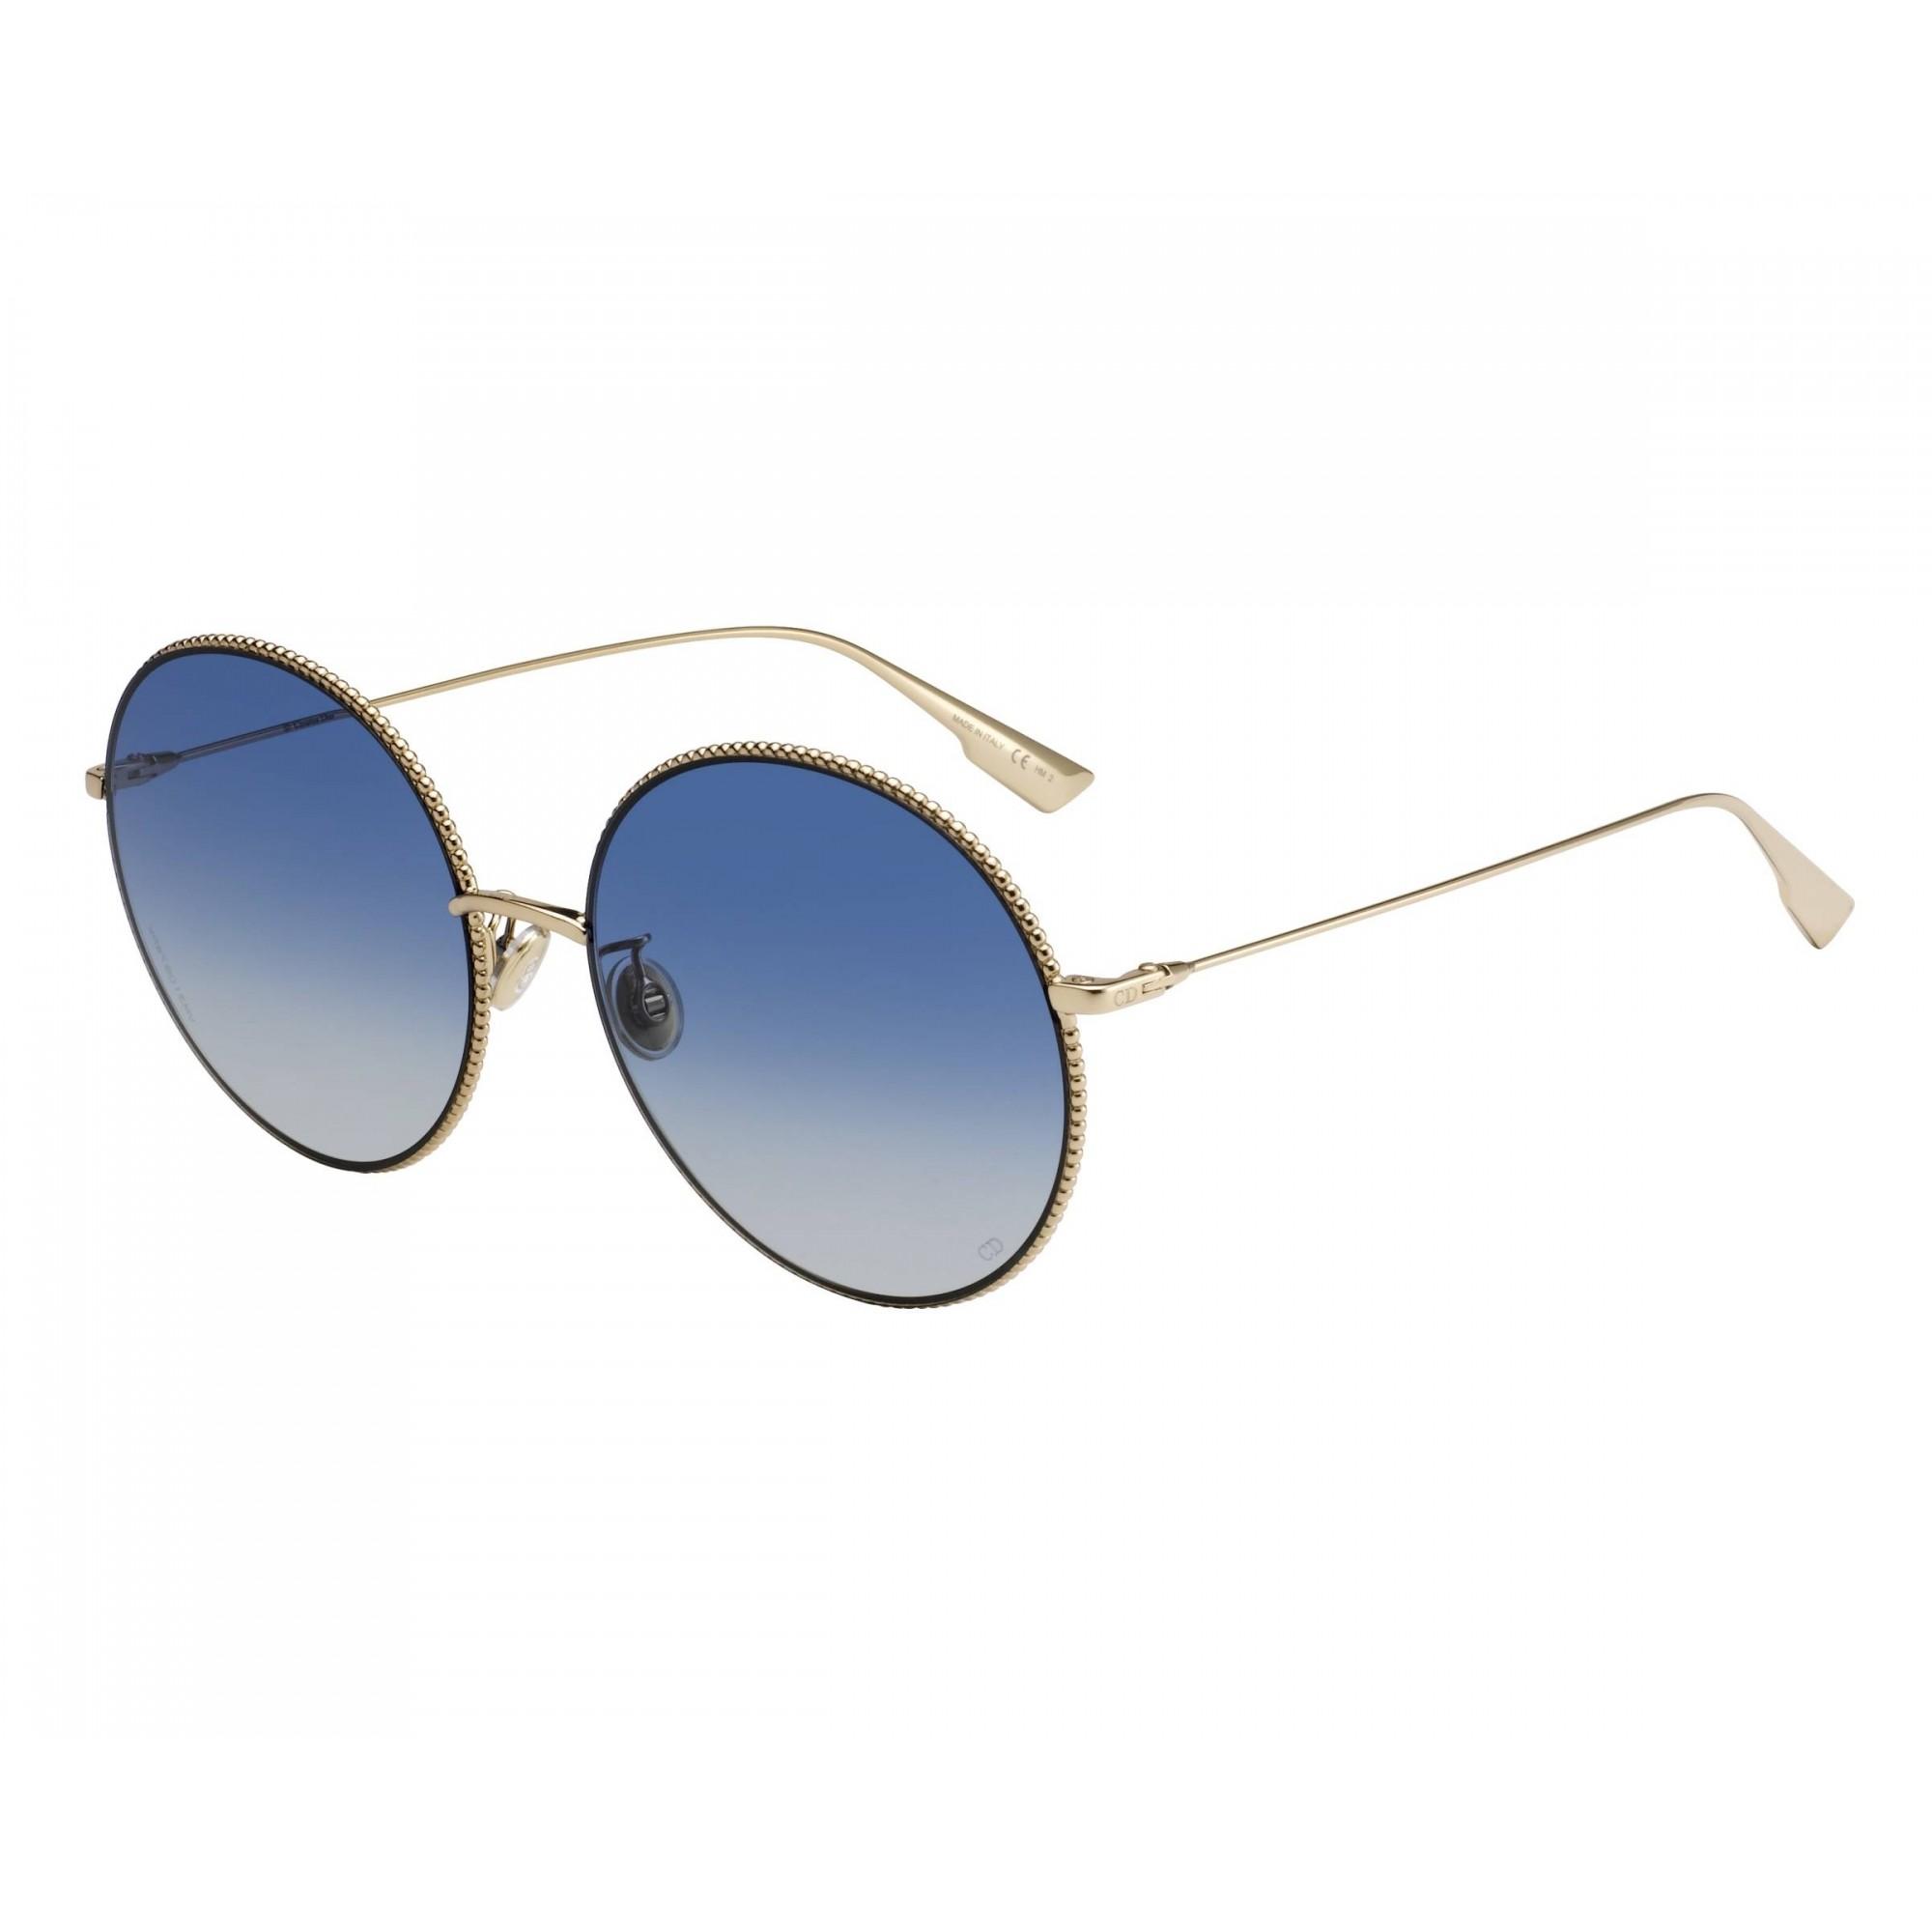 Óculos de Sol Dior Dourado DIORSOCIETY 2F - J5G/84/60